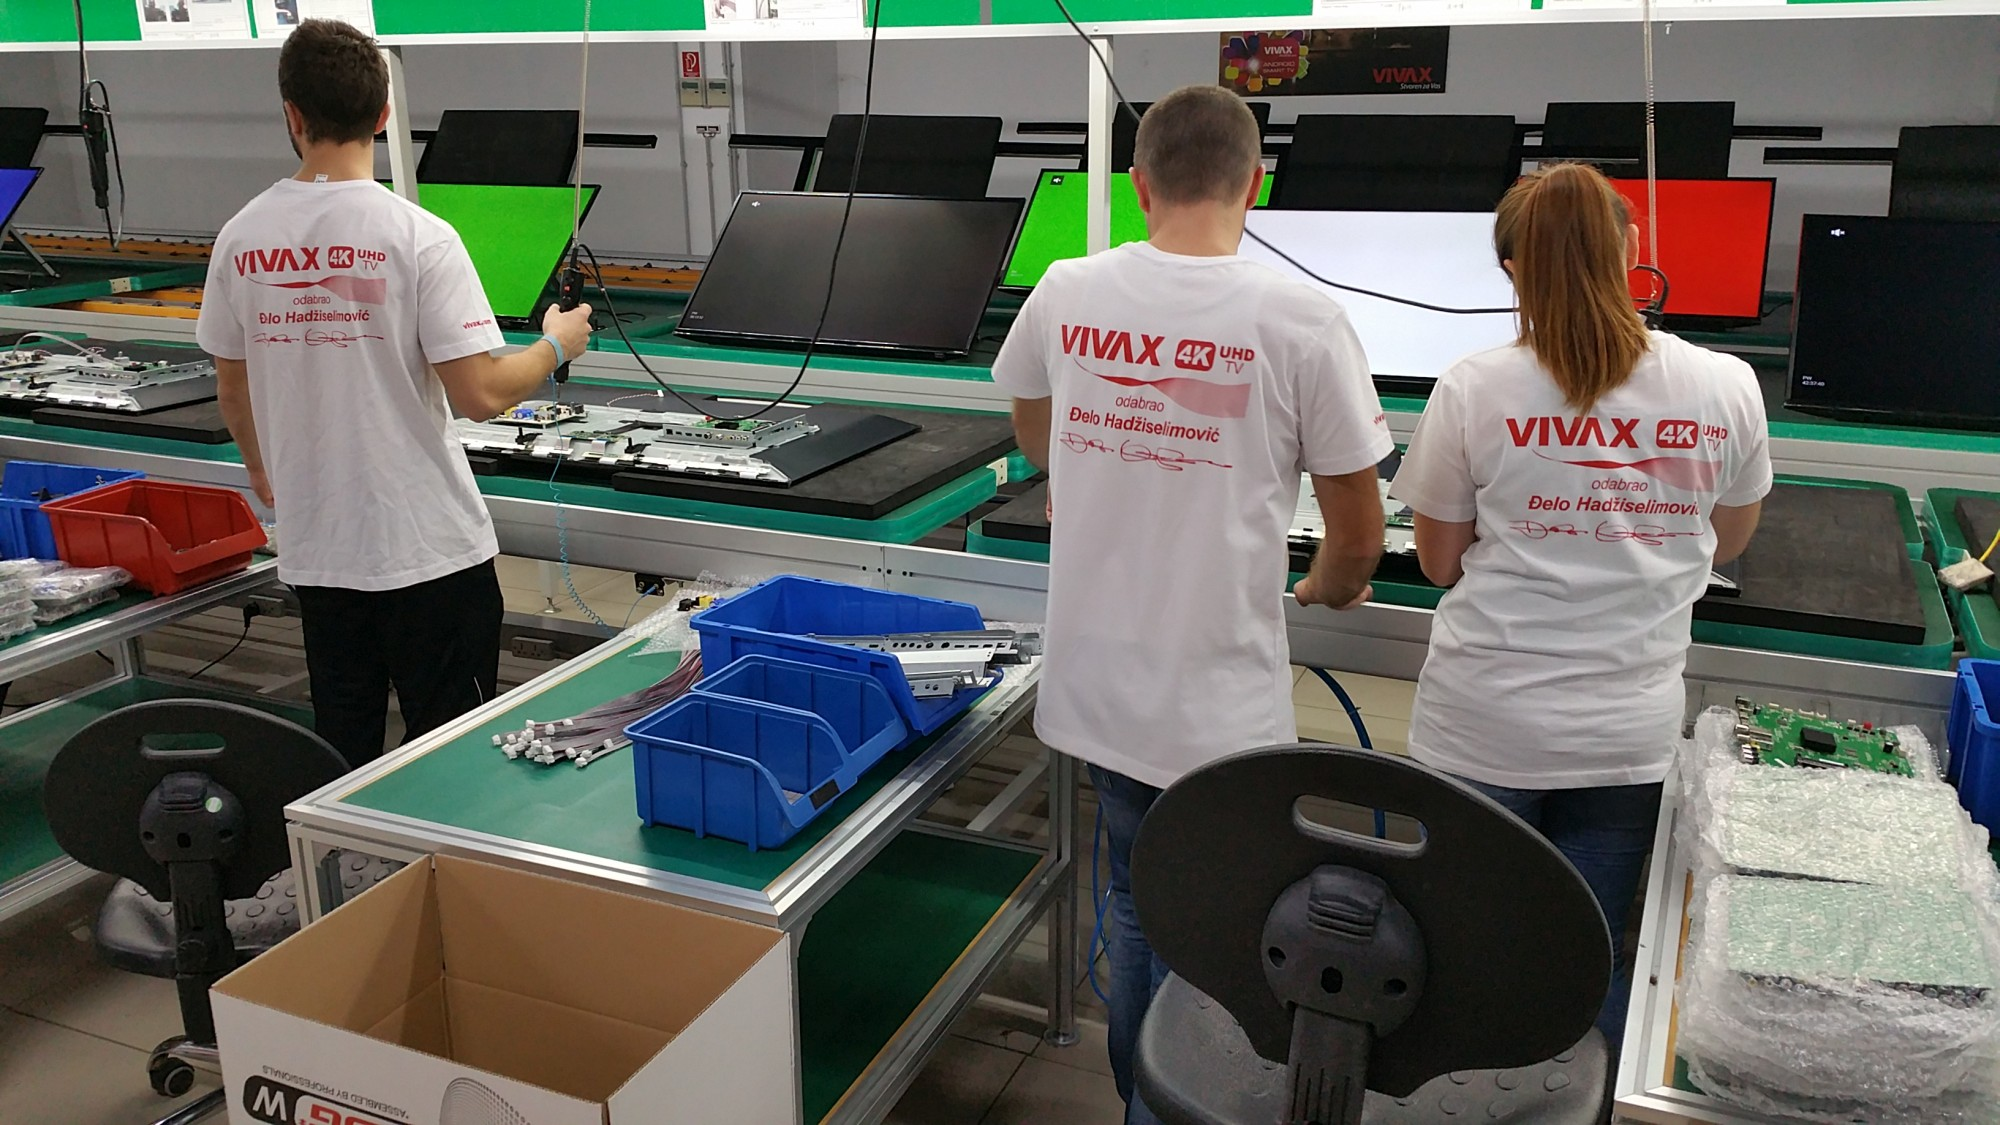 Vivax smart tv 4